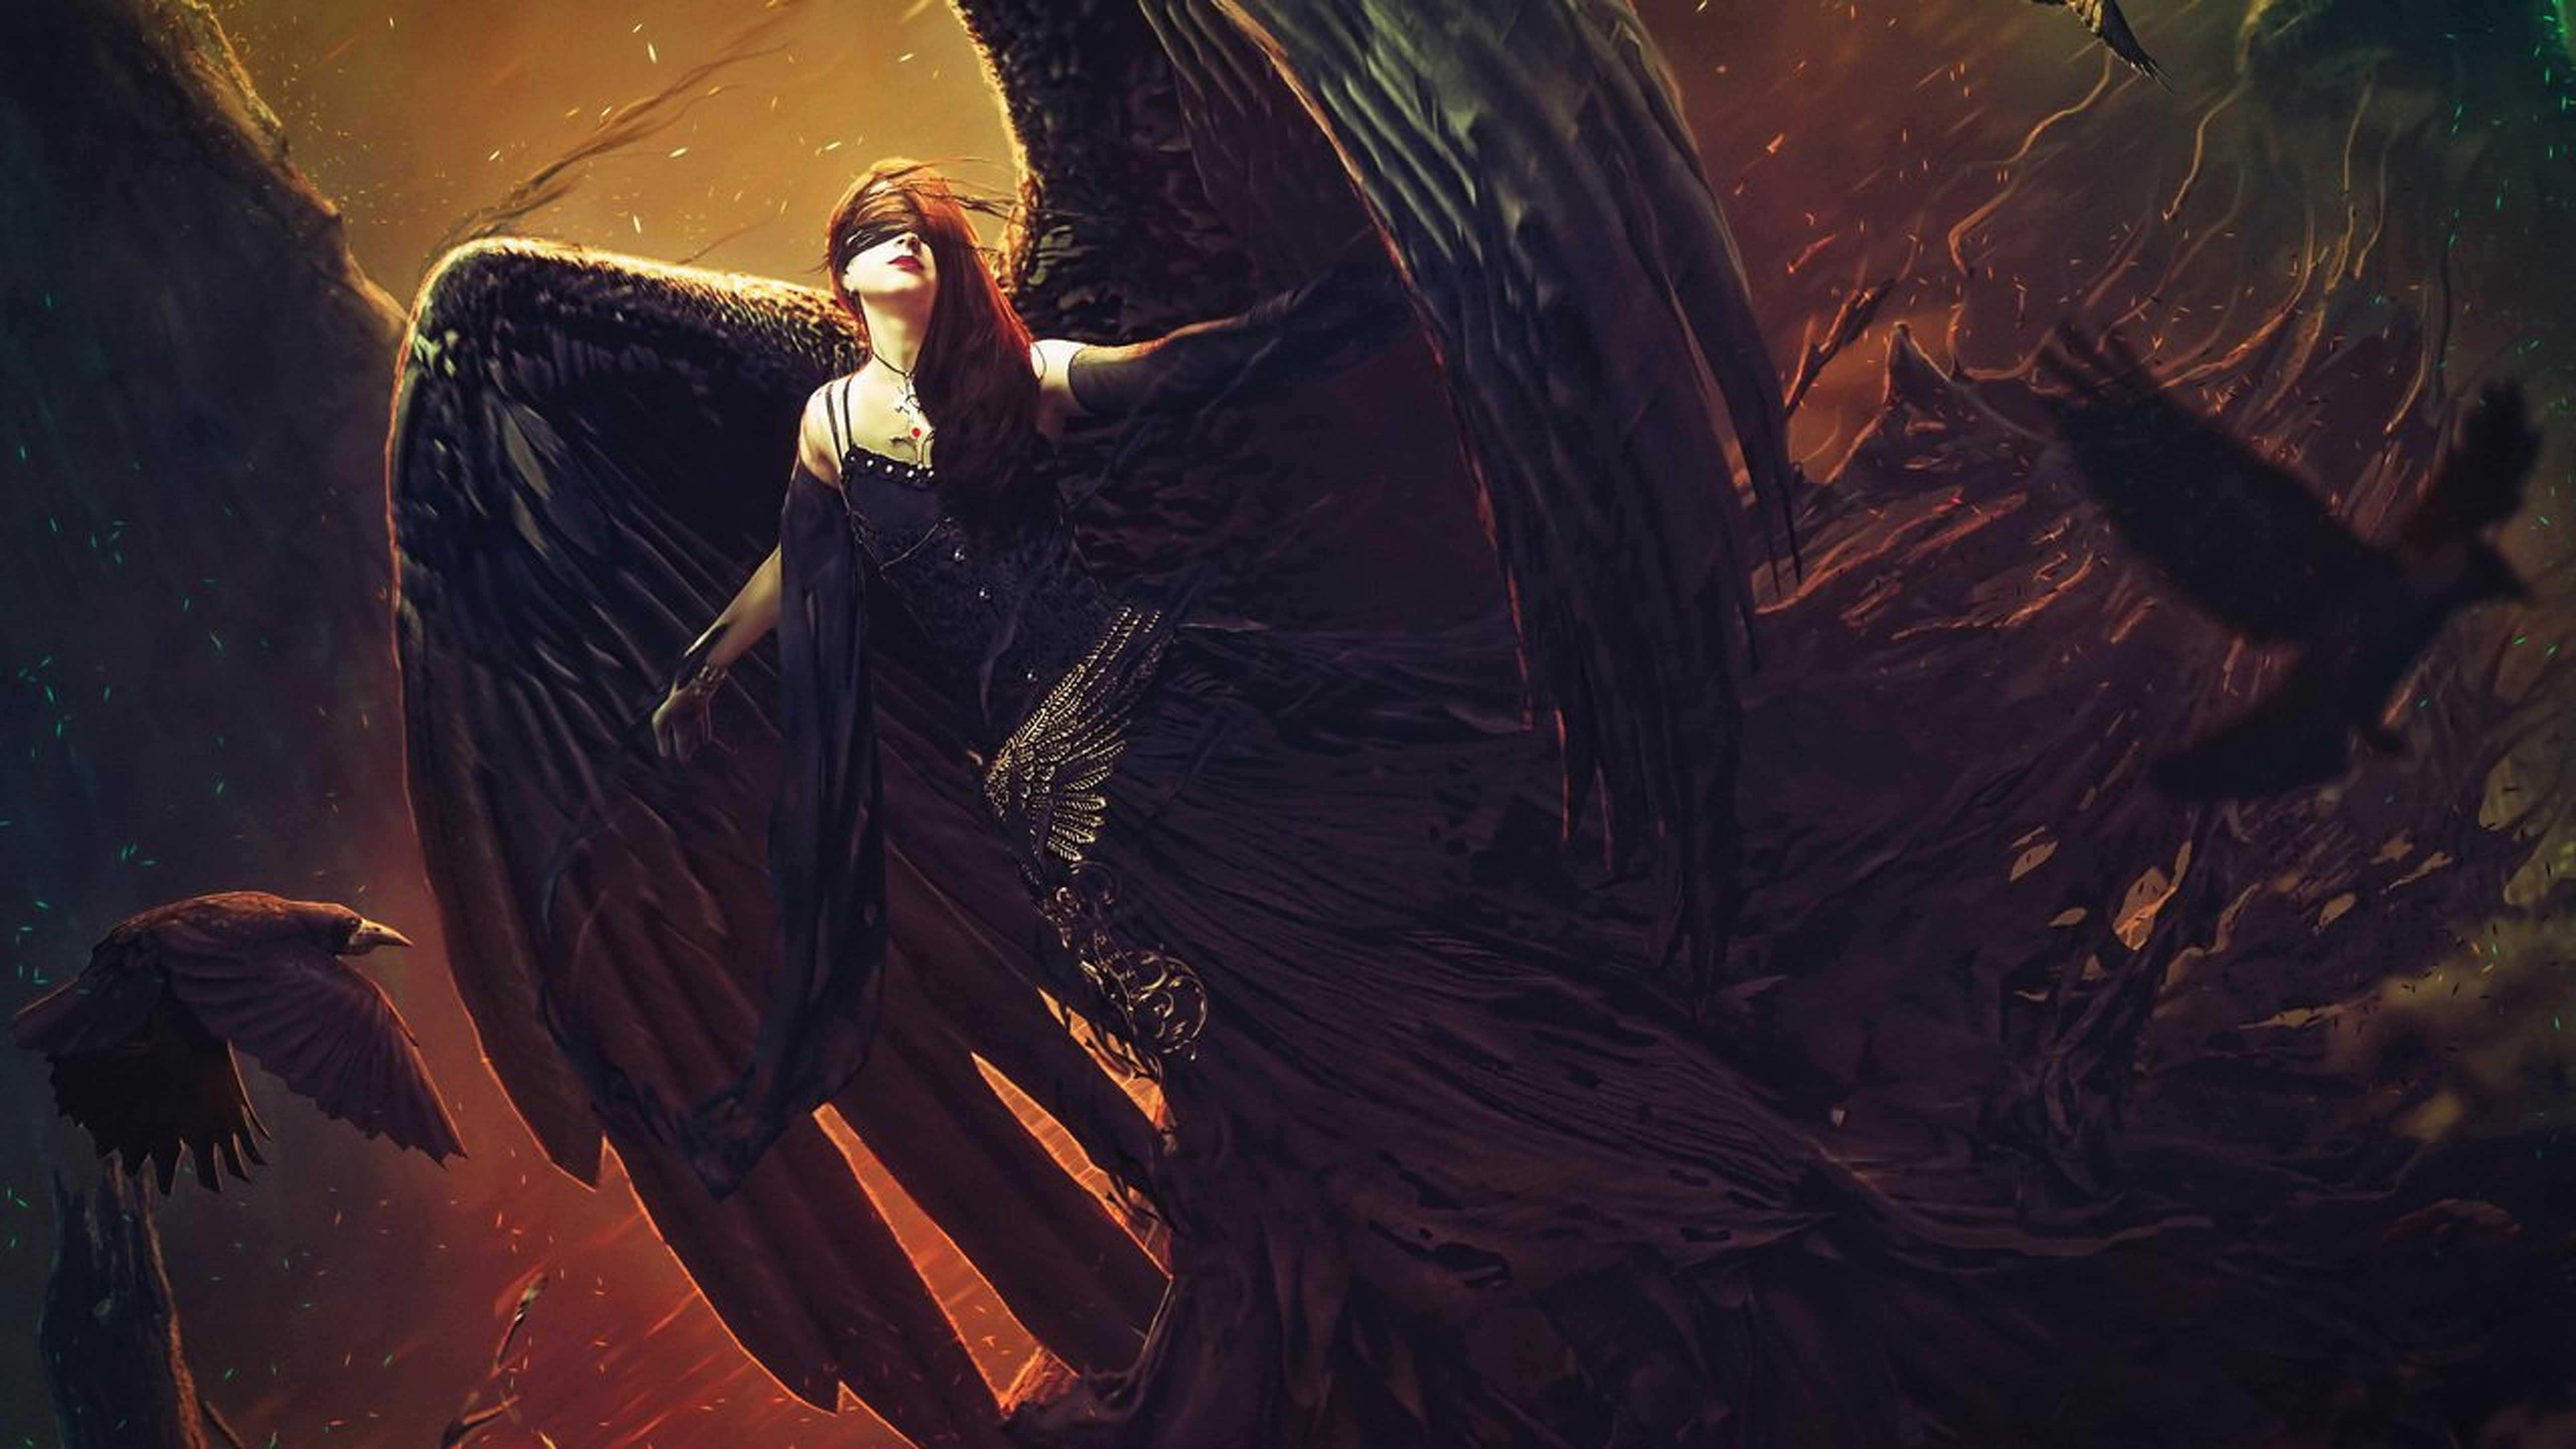 Dark Angel Fantasy Art , HD Wallpaper & Backgrounds